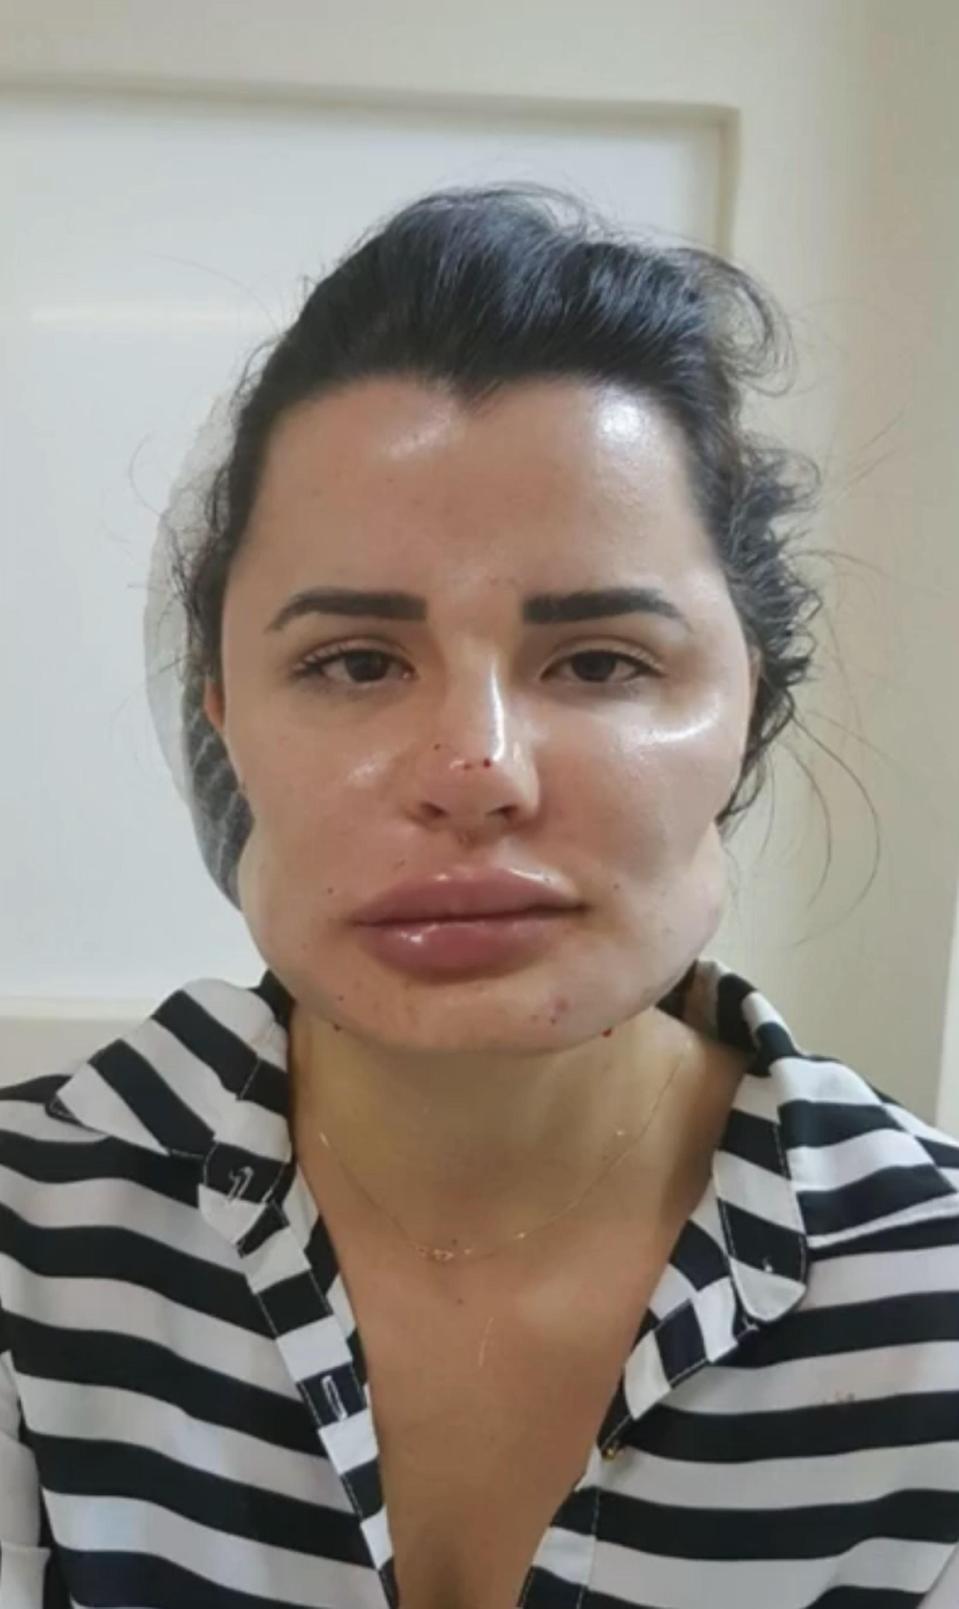 deformati chirurgo plastico brasile